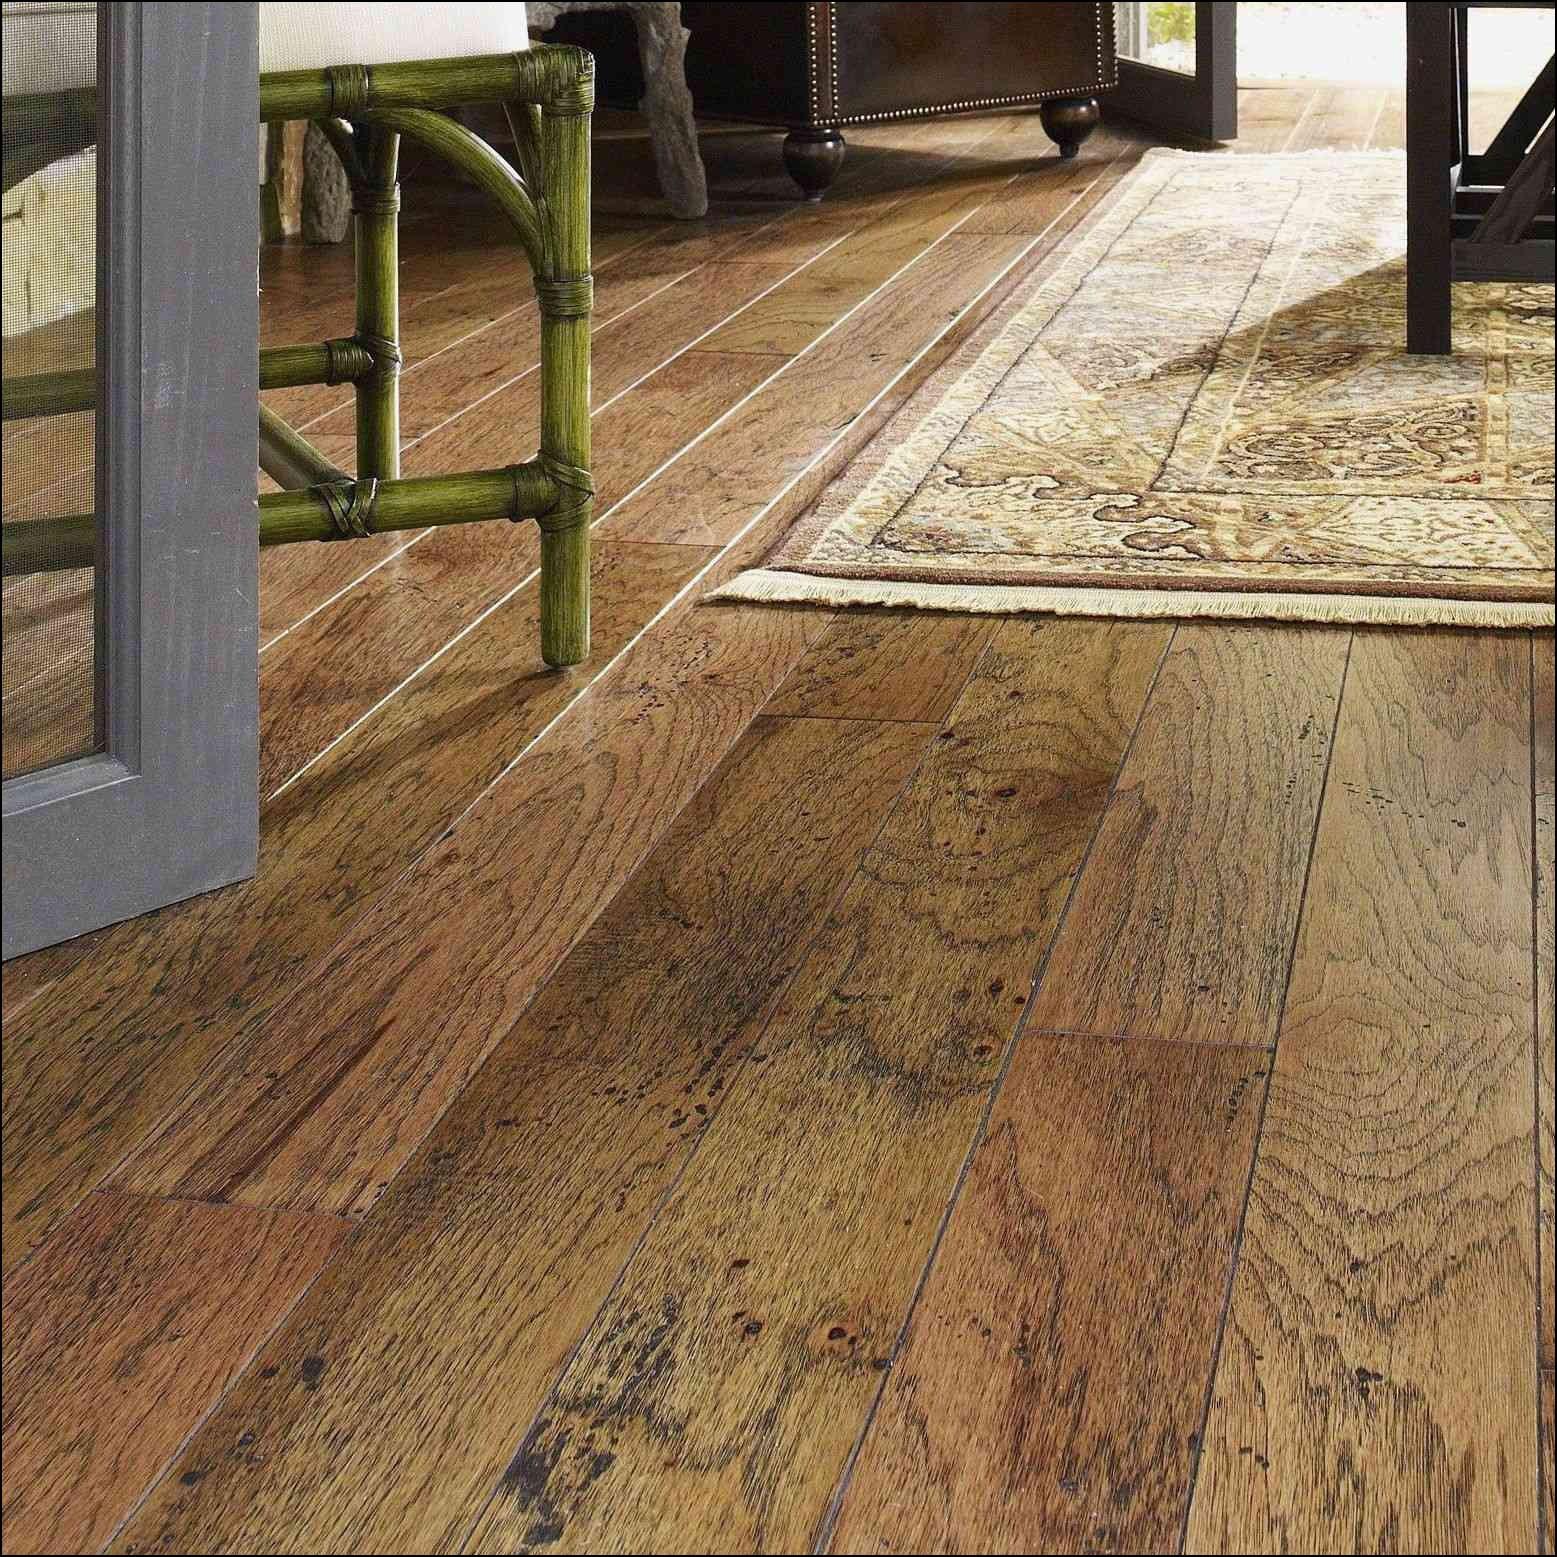 wide plank grey hardwood flooring of wide plank flooring ideas for wide plank dark wood flooring images best type wood flooring best floor floor wood floor wood